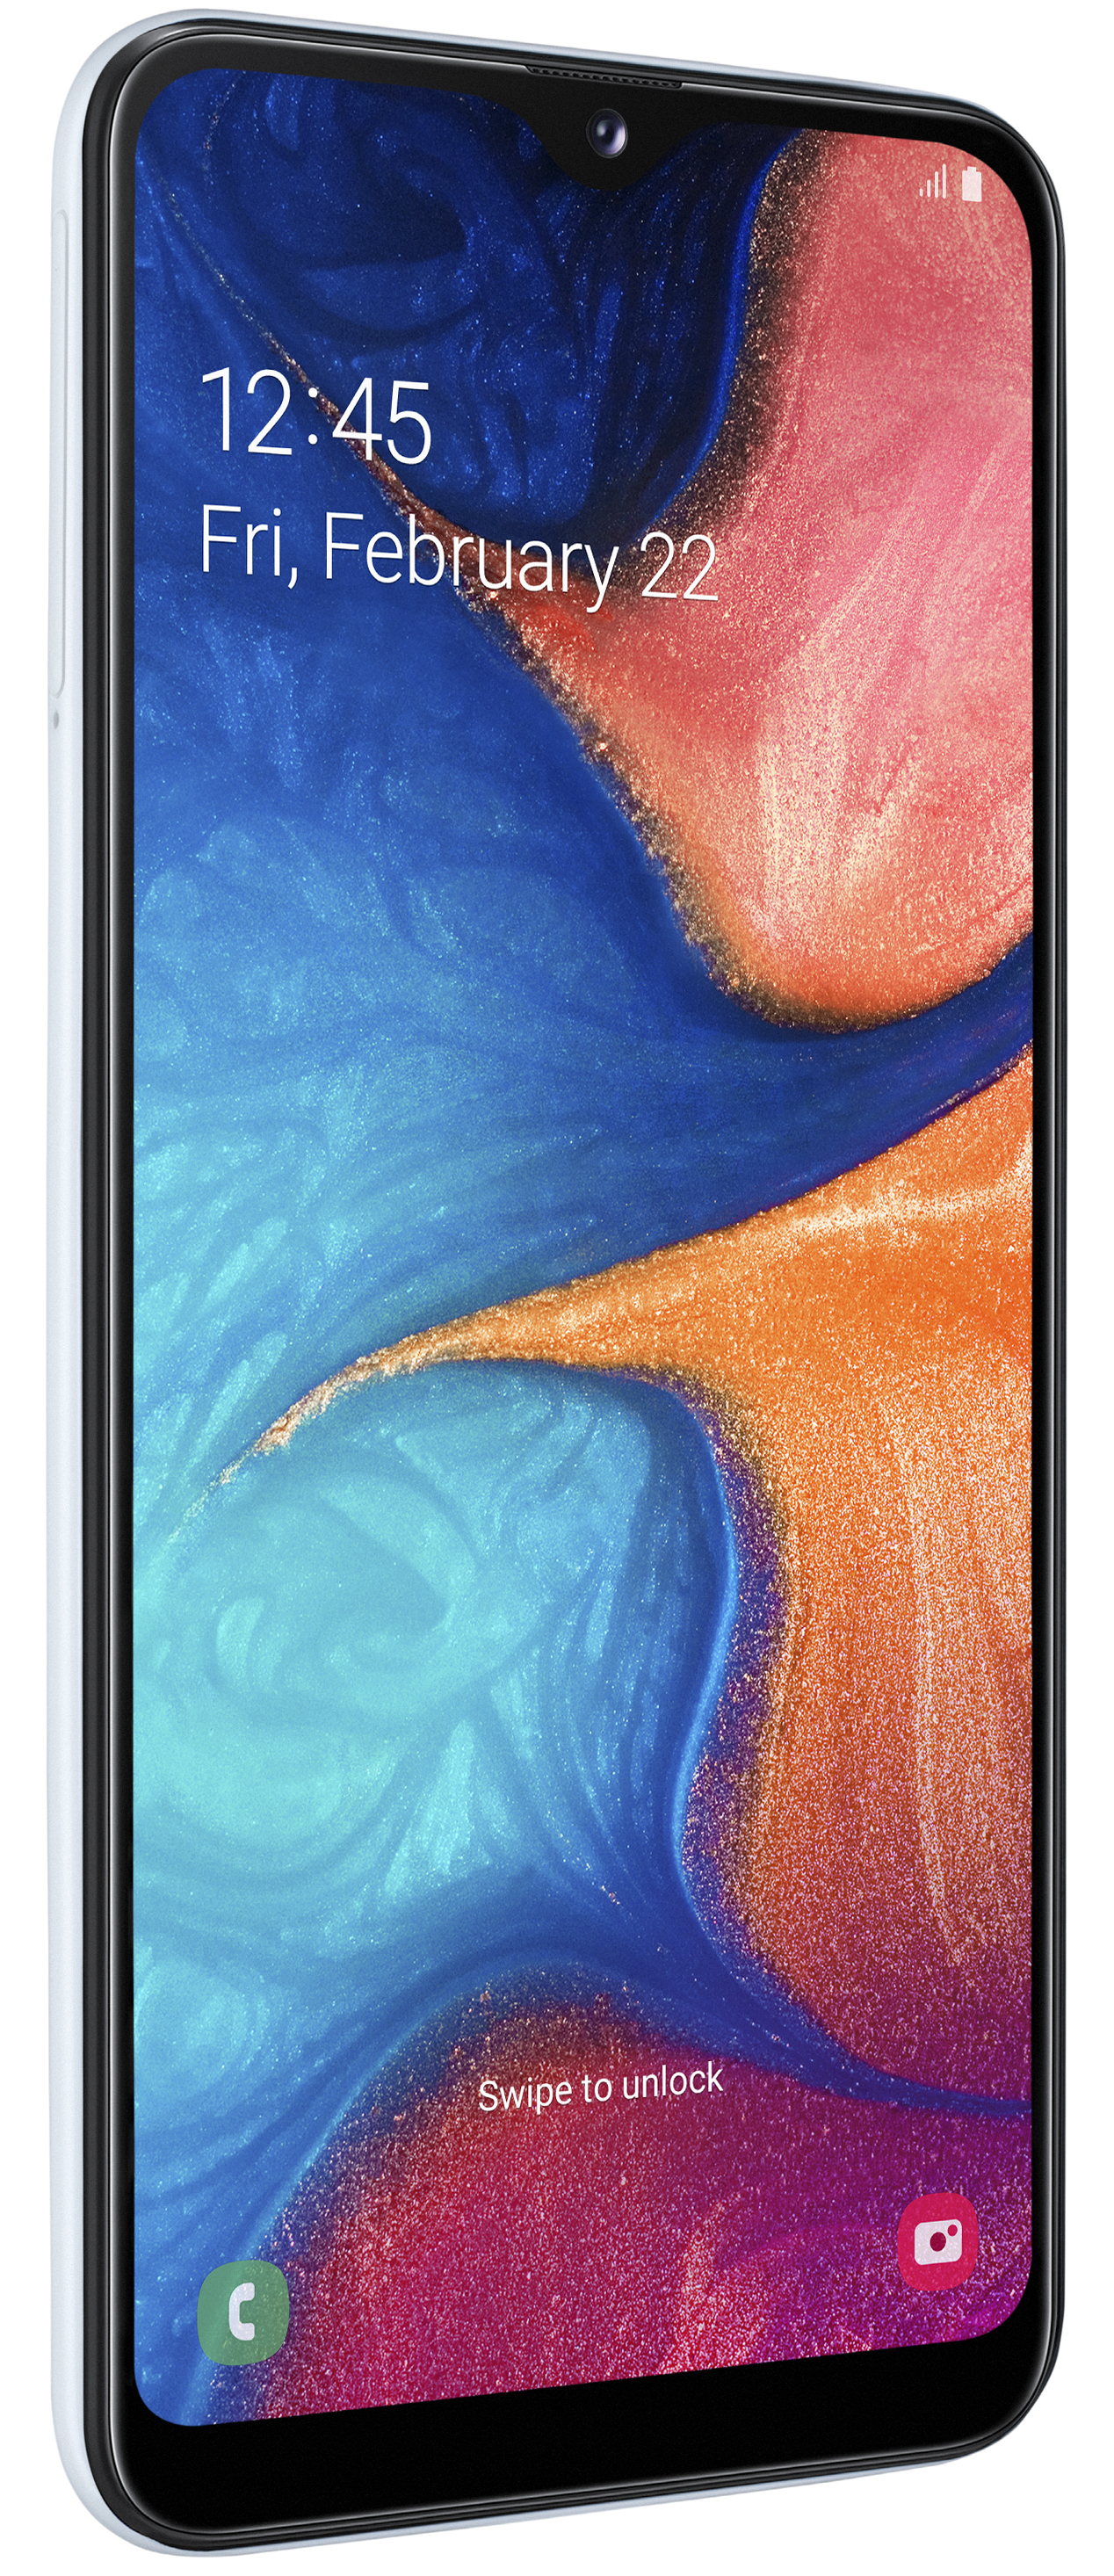 Samsung Galaxy A20e SM-A202F, 14,7 cm (5.8 ), 3 GB, 32 GB, 13 MP, Android 9.0, Wit